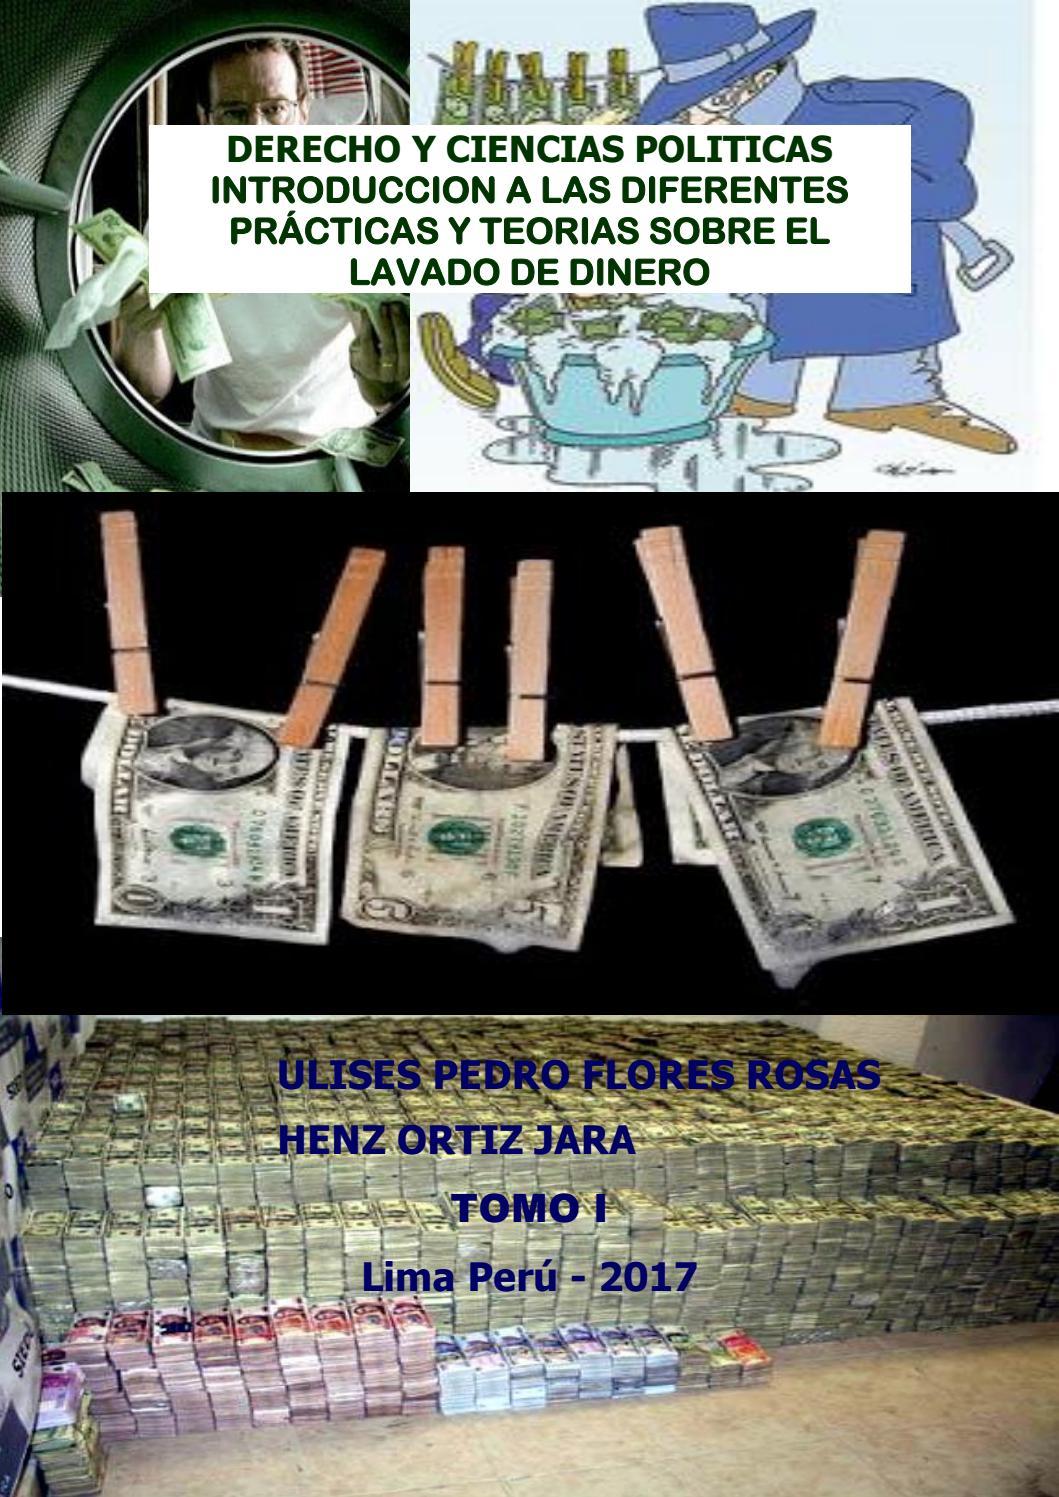 Tragamonedas de pescados gratis descargar juego de loteria Curitiba-270721